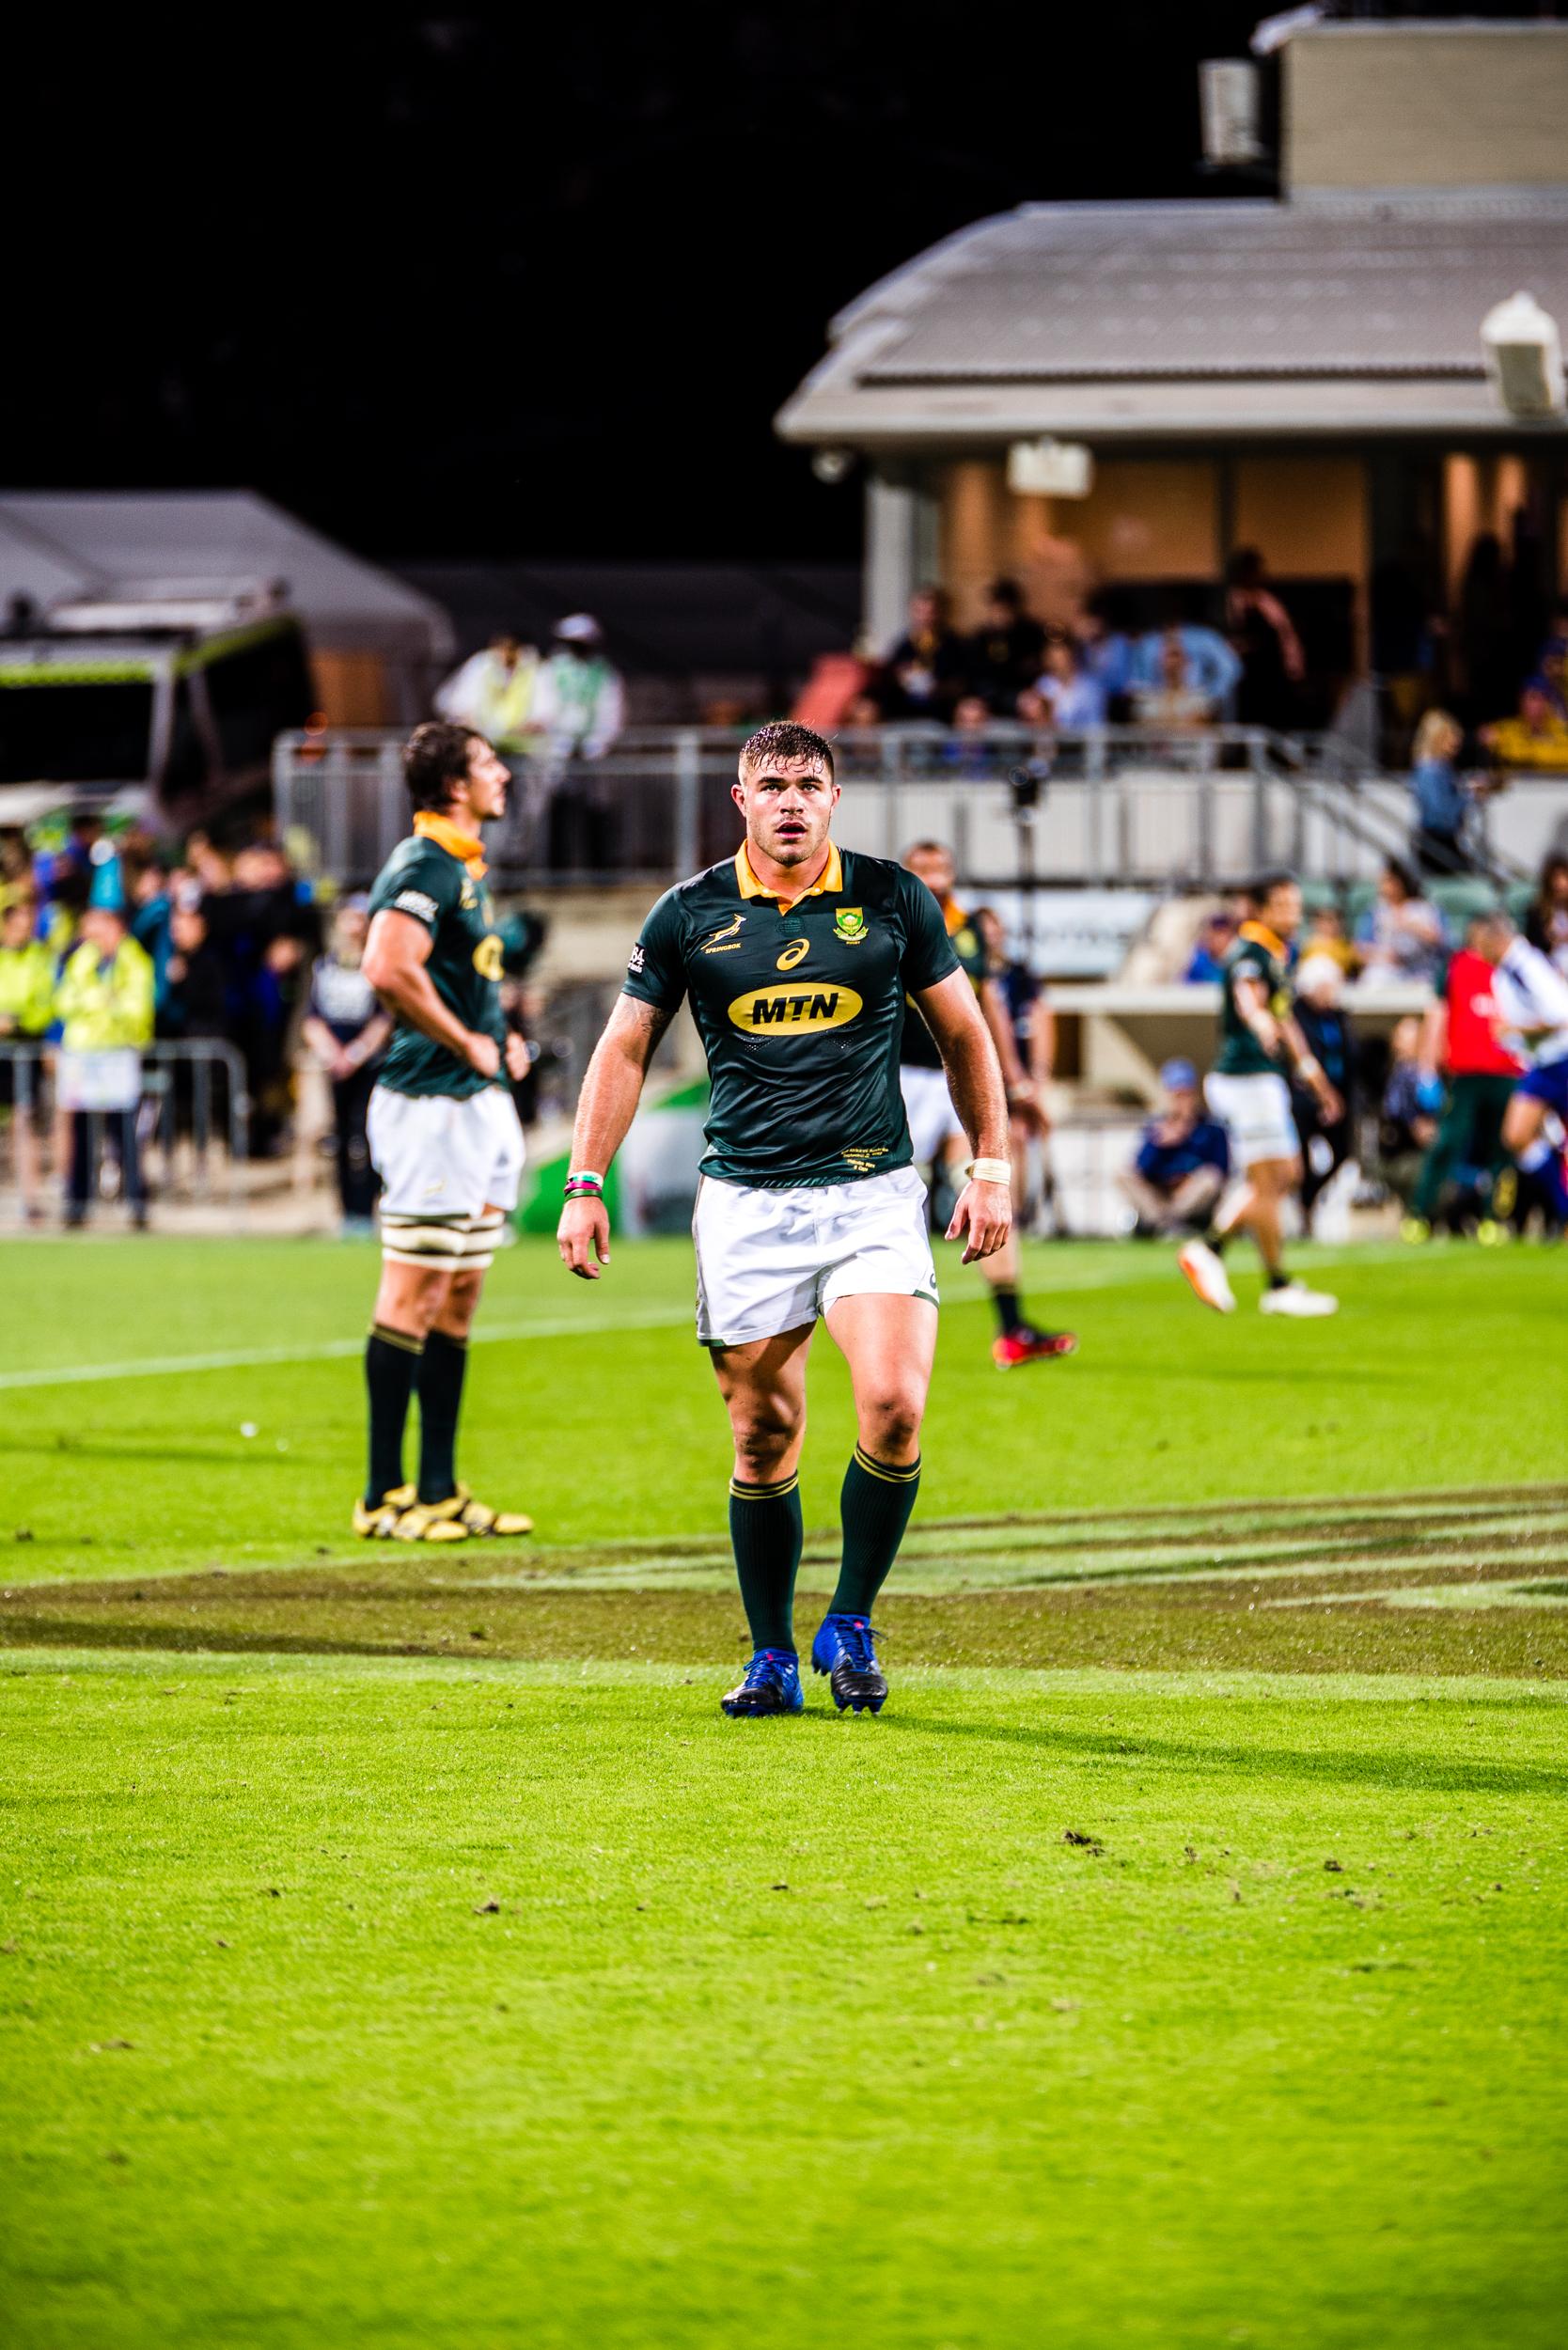 Spyrides_Kyle_RugbyChampionship_Perth_9.9.2017_DSC7273.jpg